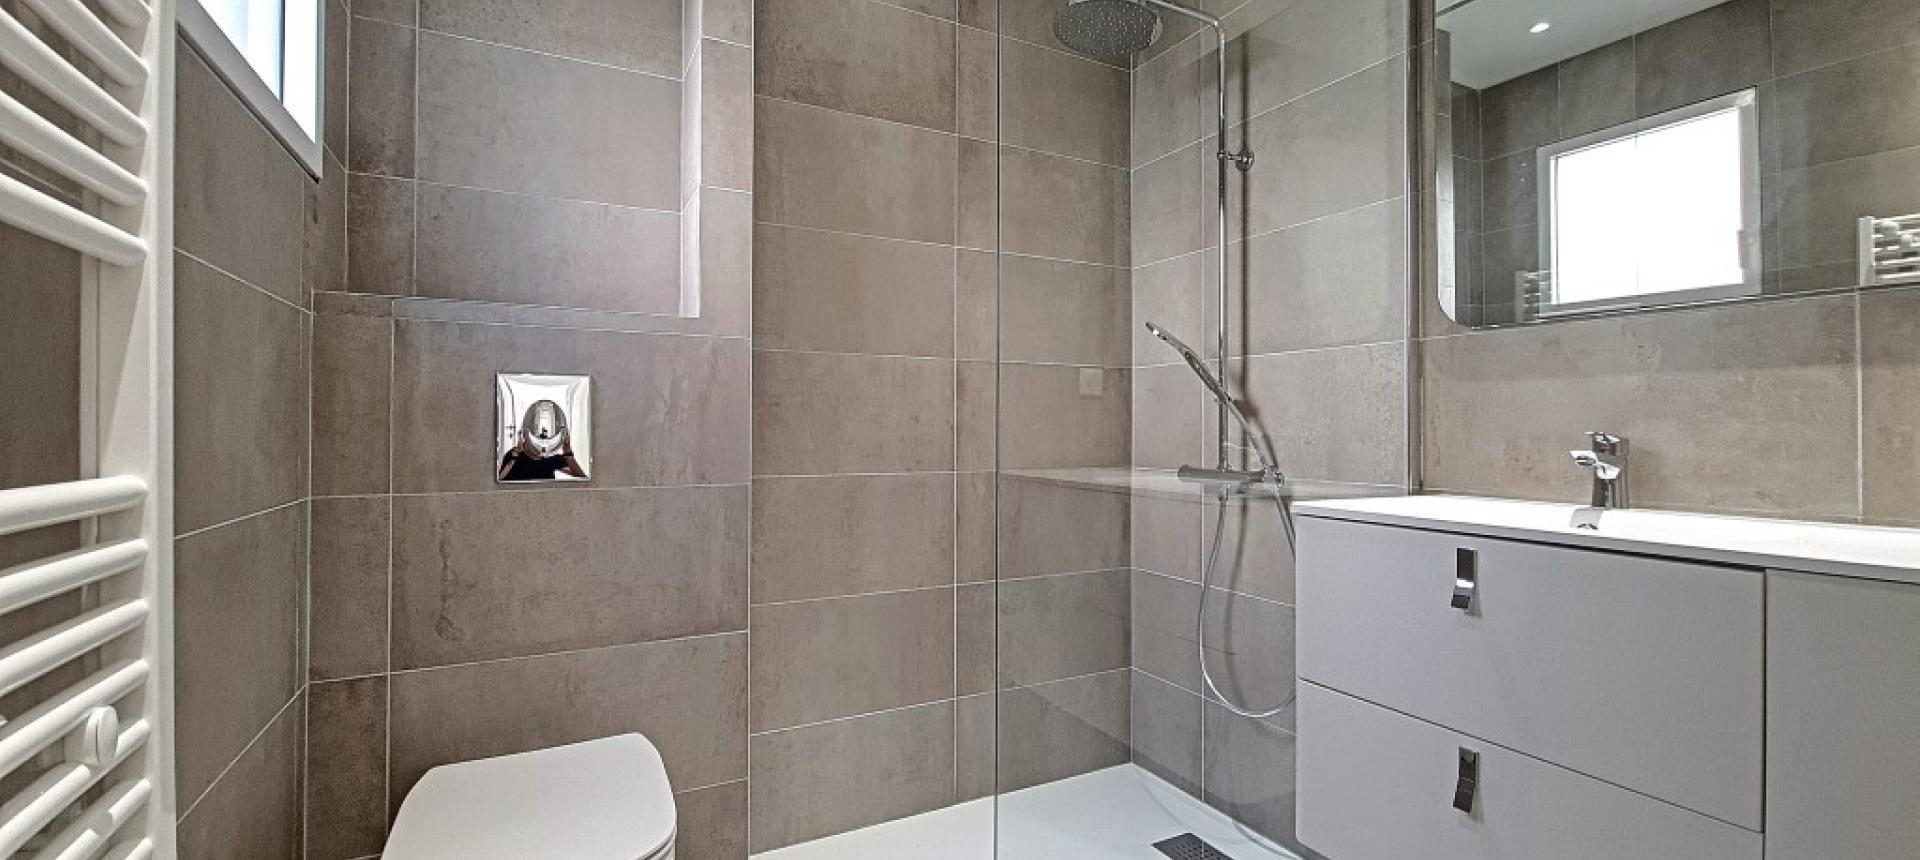 F3 à louer  Albert 1er Forcone salle de  douche